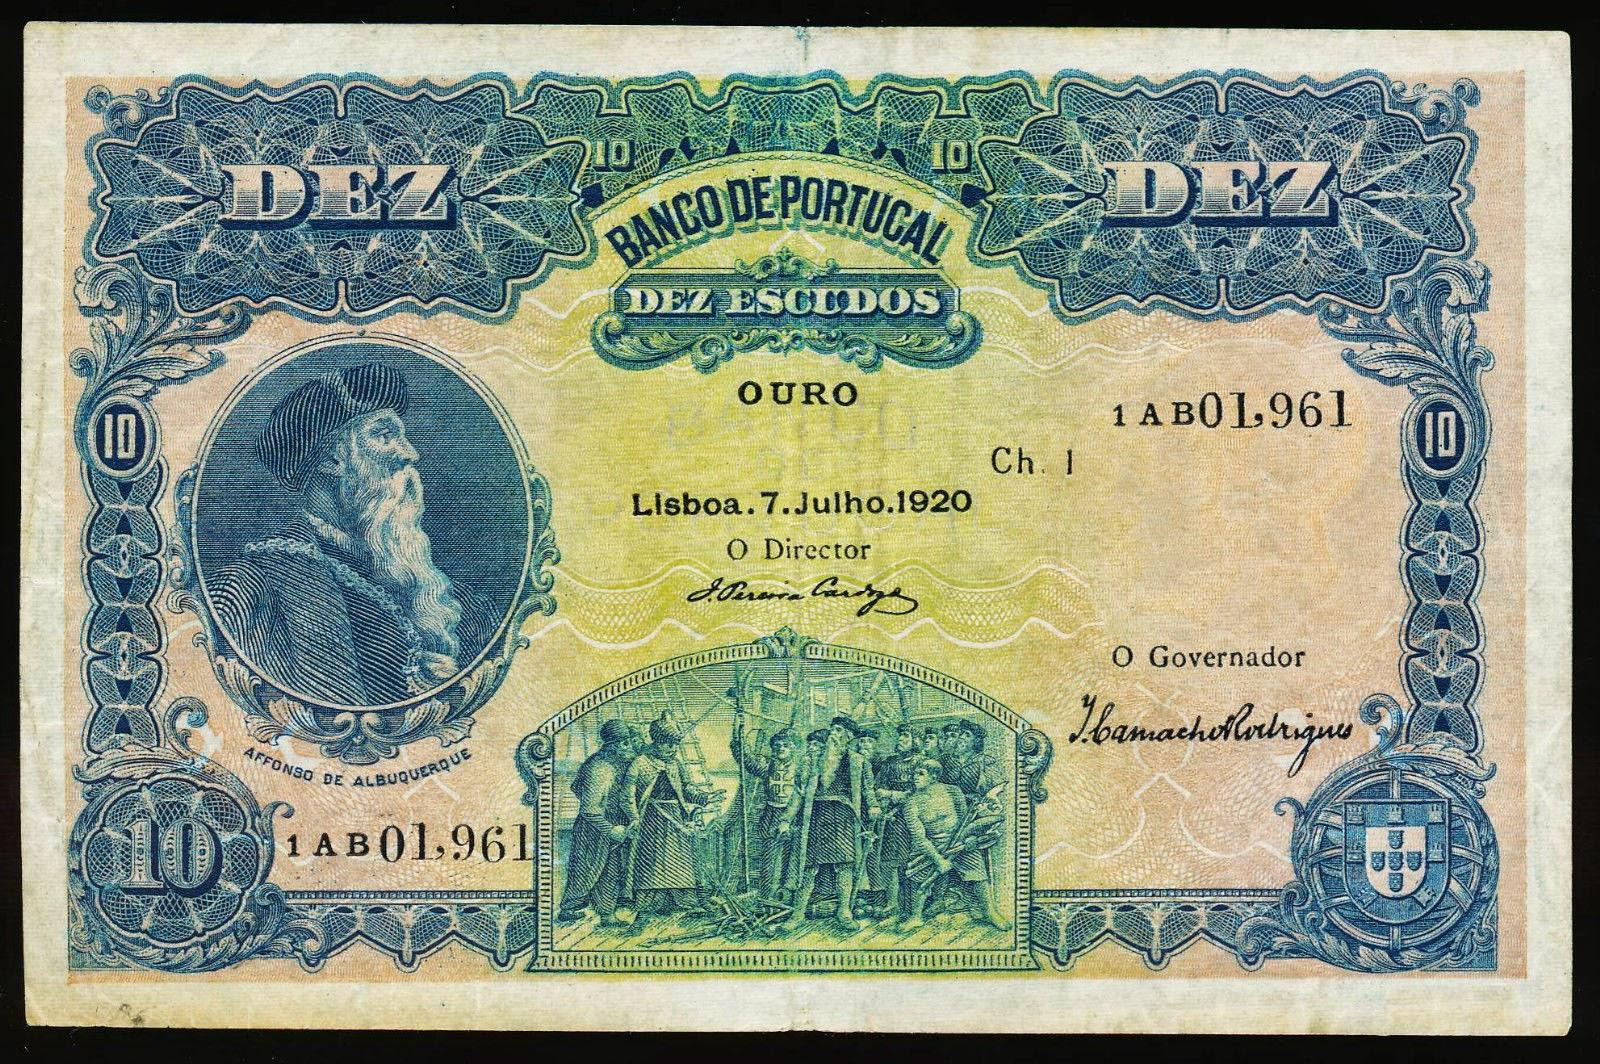 Portugal 10 Escudos banknote 1920 Afonso de Albuquerque